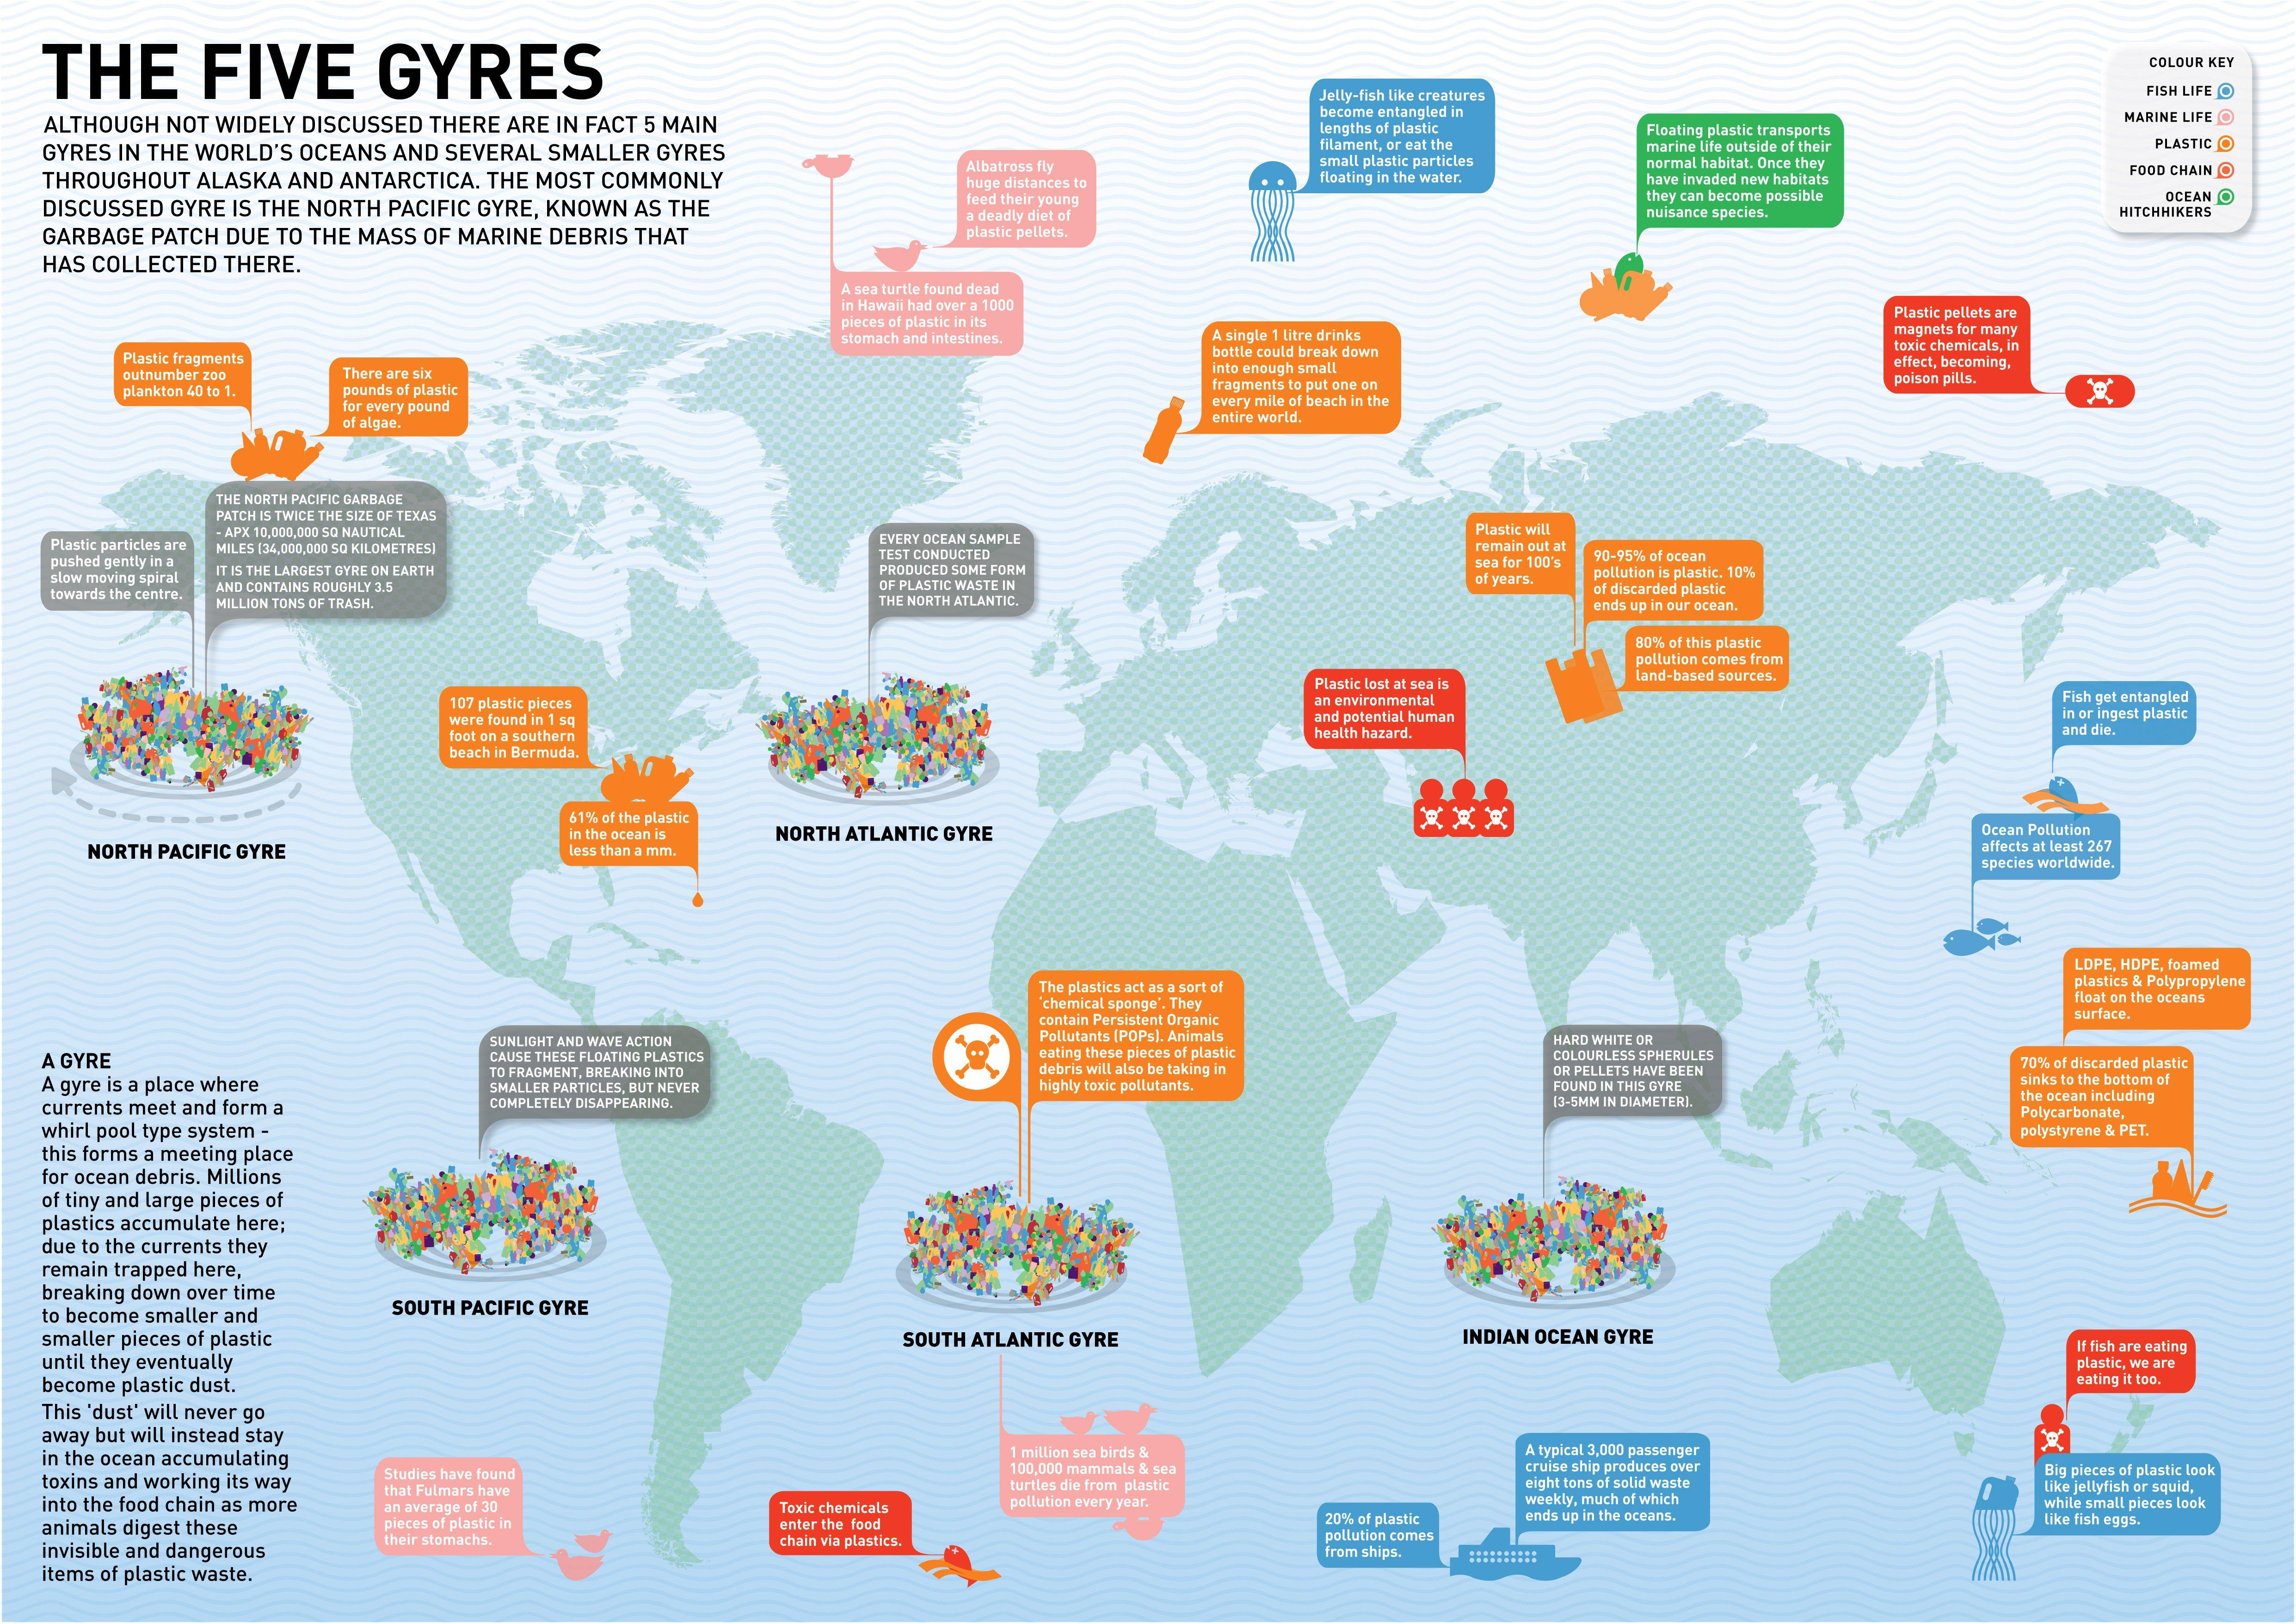 North Atlantic Gyre